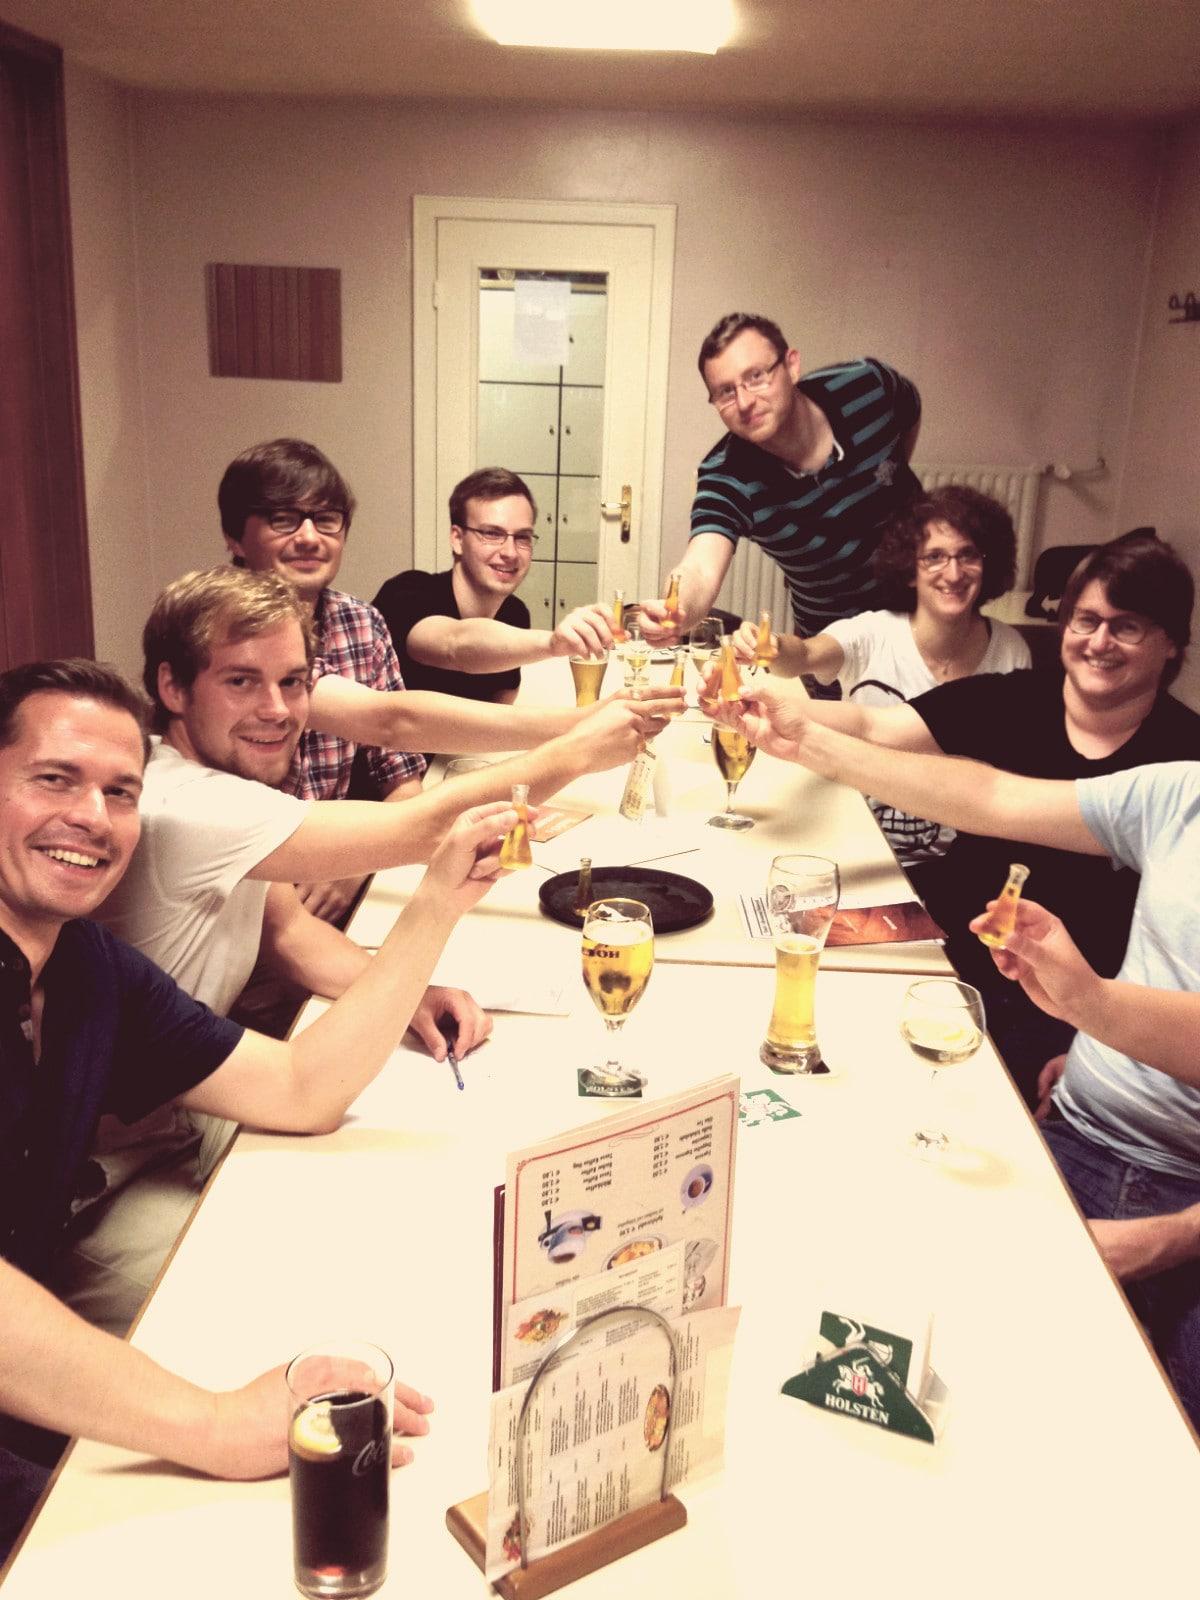 Hobby-Kegeln: Spielspaß in geselliger Runde